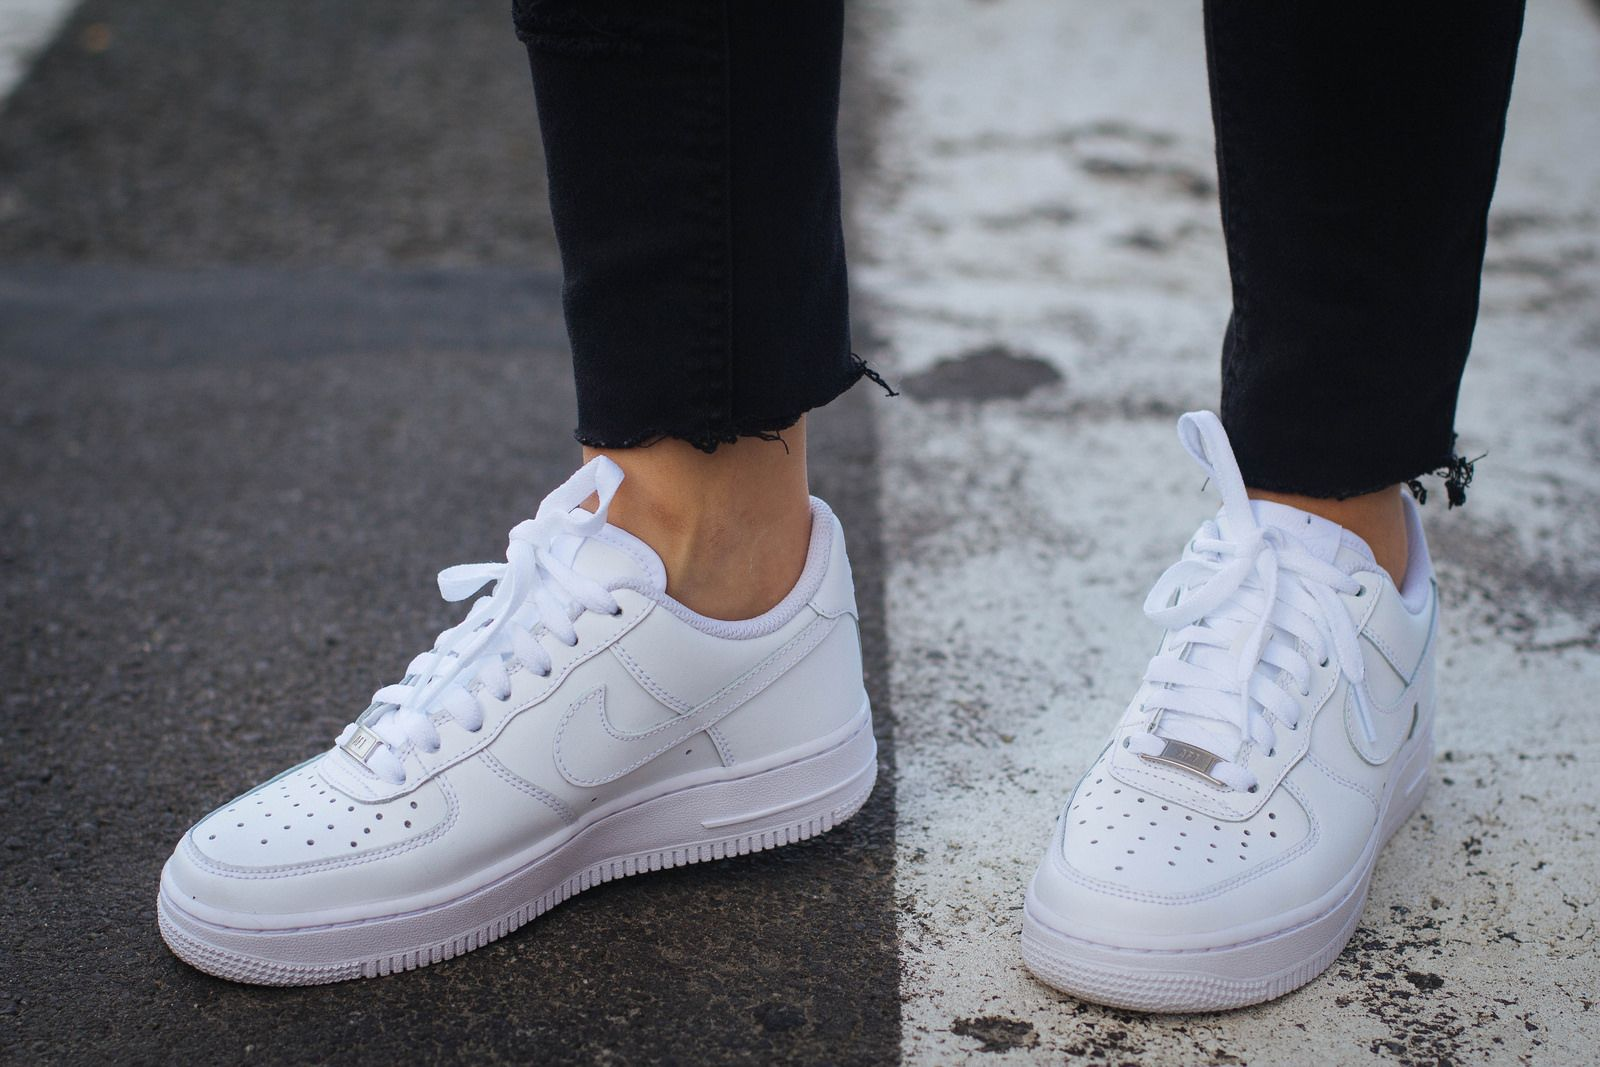 Nike Air Force | On High Heels